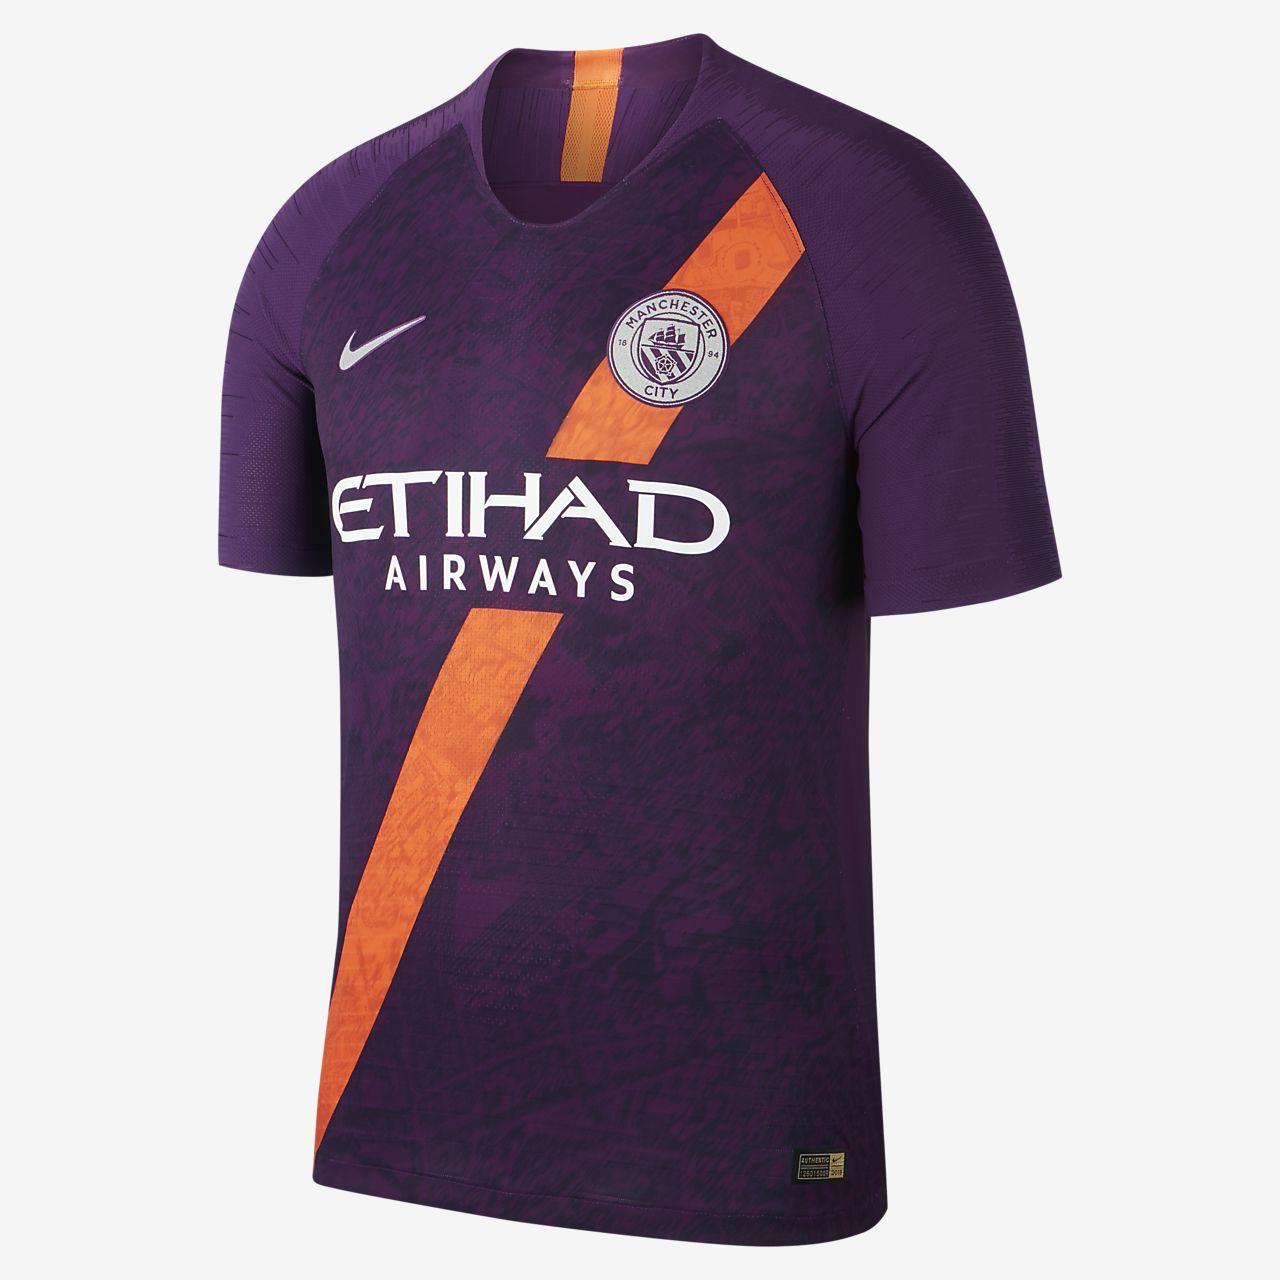 Camiseta de fútbol para hombre Manchester 2018/19 Manchester City FC Vapor Match Third